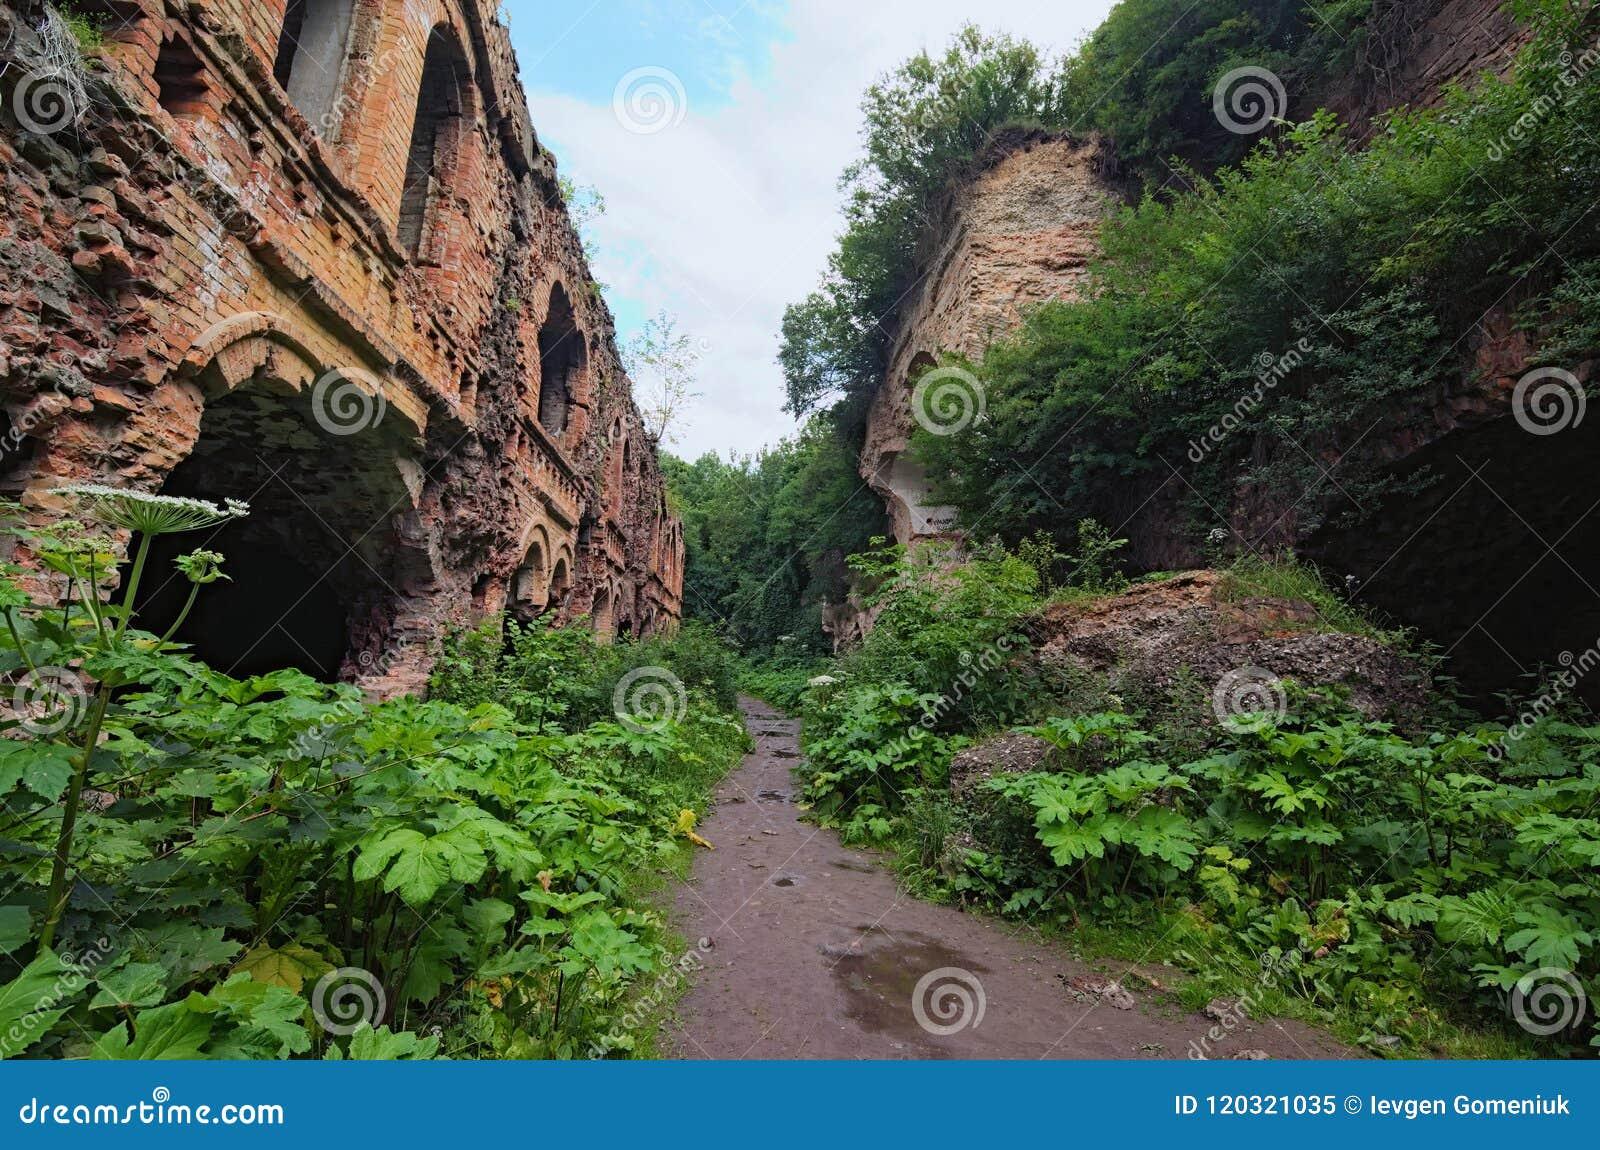 Ruines de la fortification de fort de Tarakanivskiy, monument architectural de 19ème siècle Tarakaniv, oblast de Rivne, Ukraine